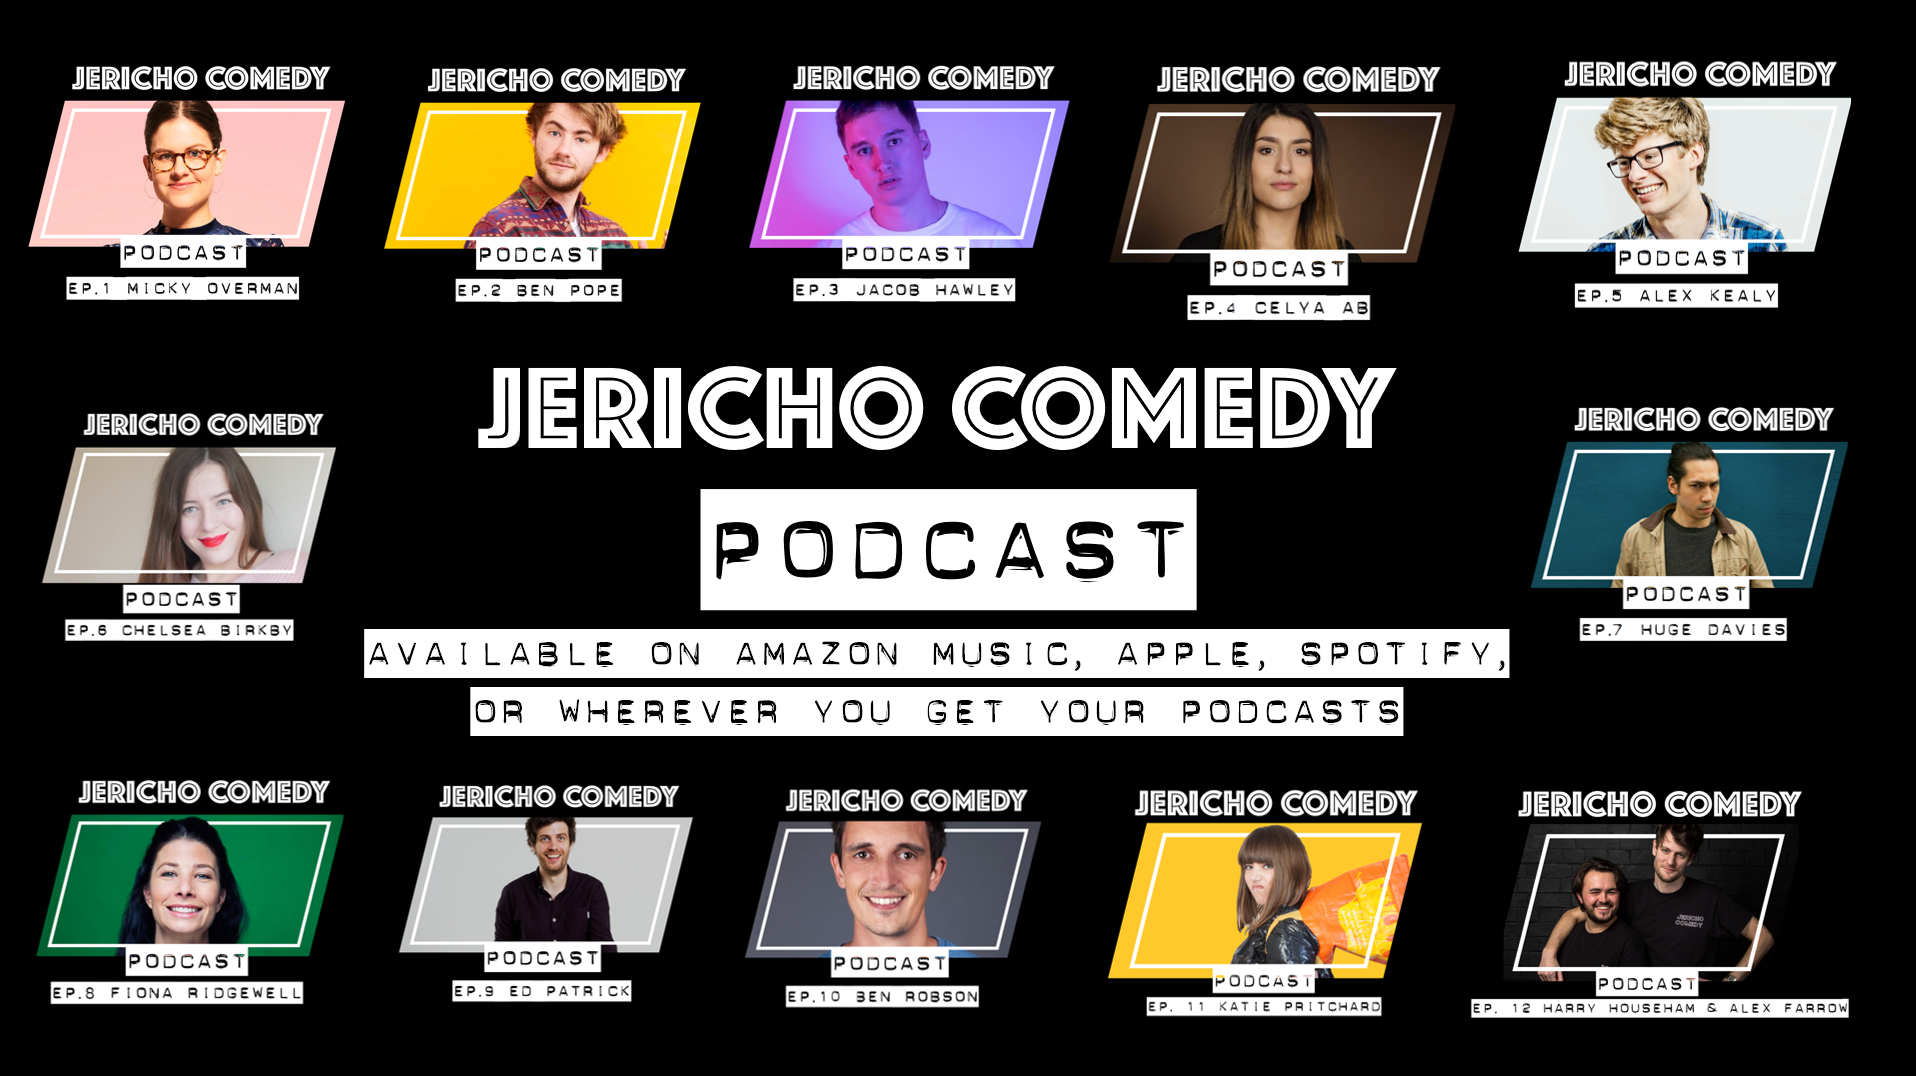 The Jericho Comedy Podcast